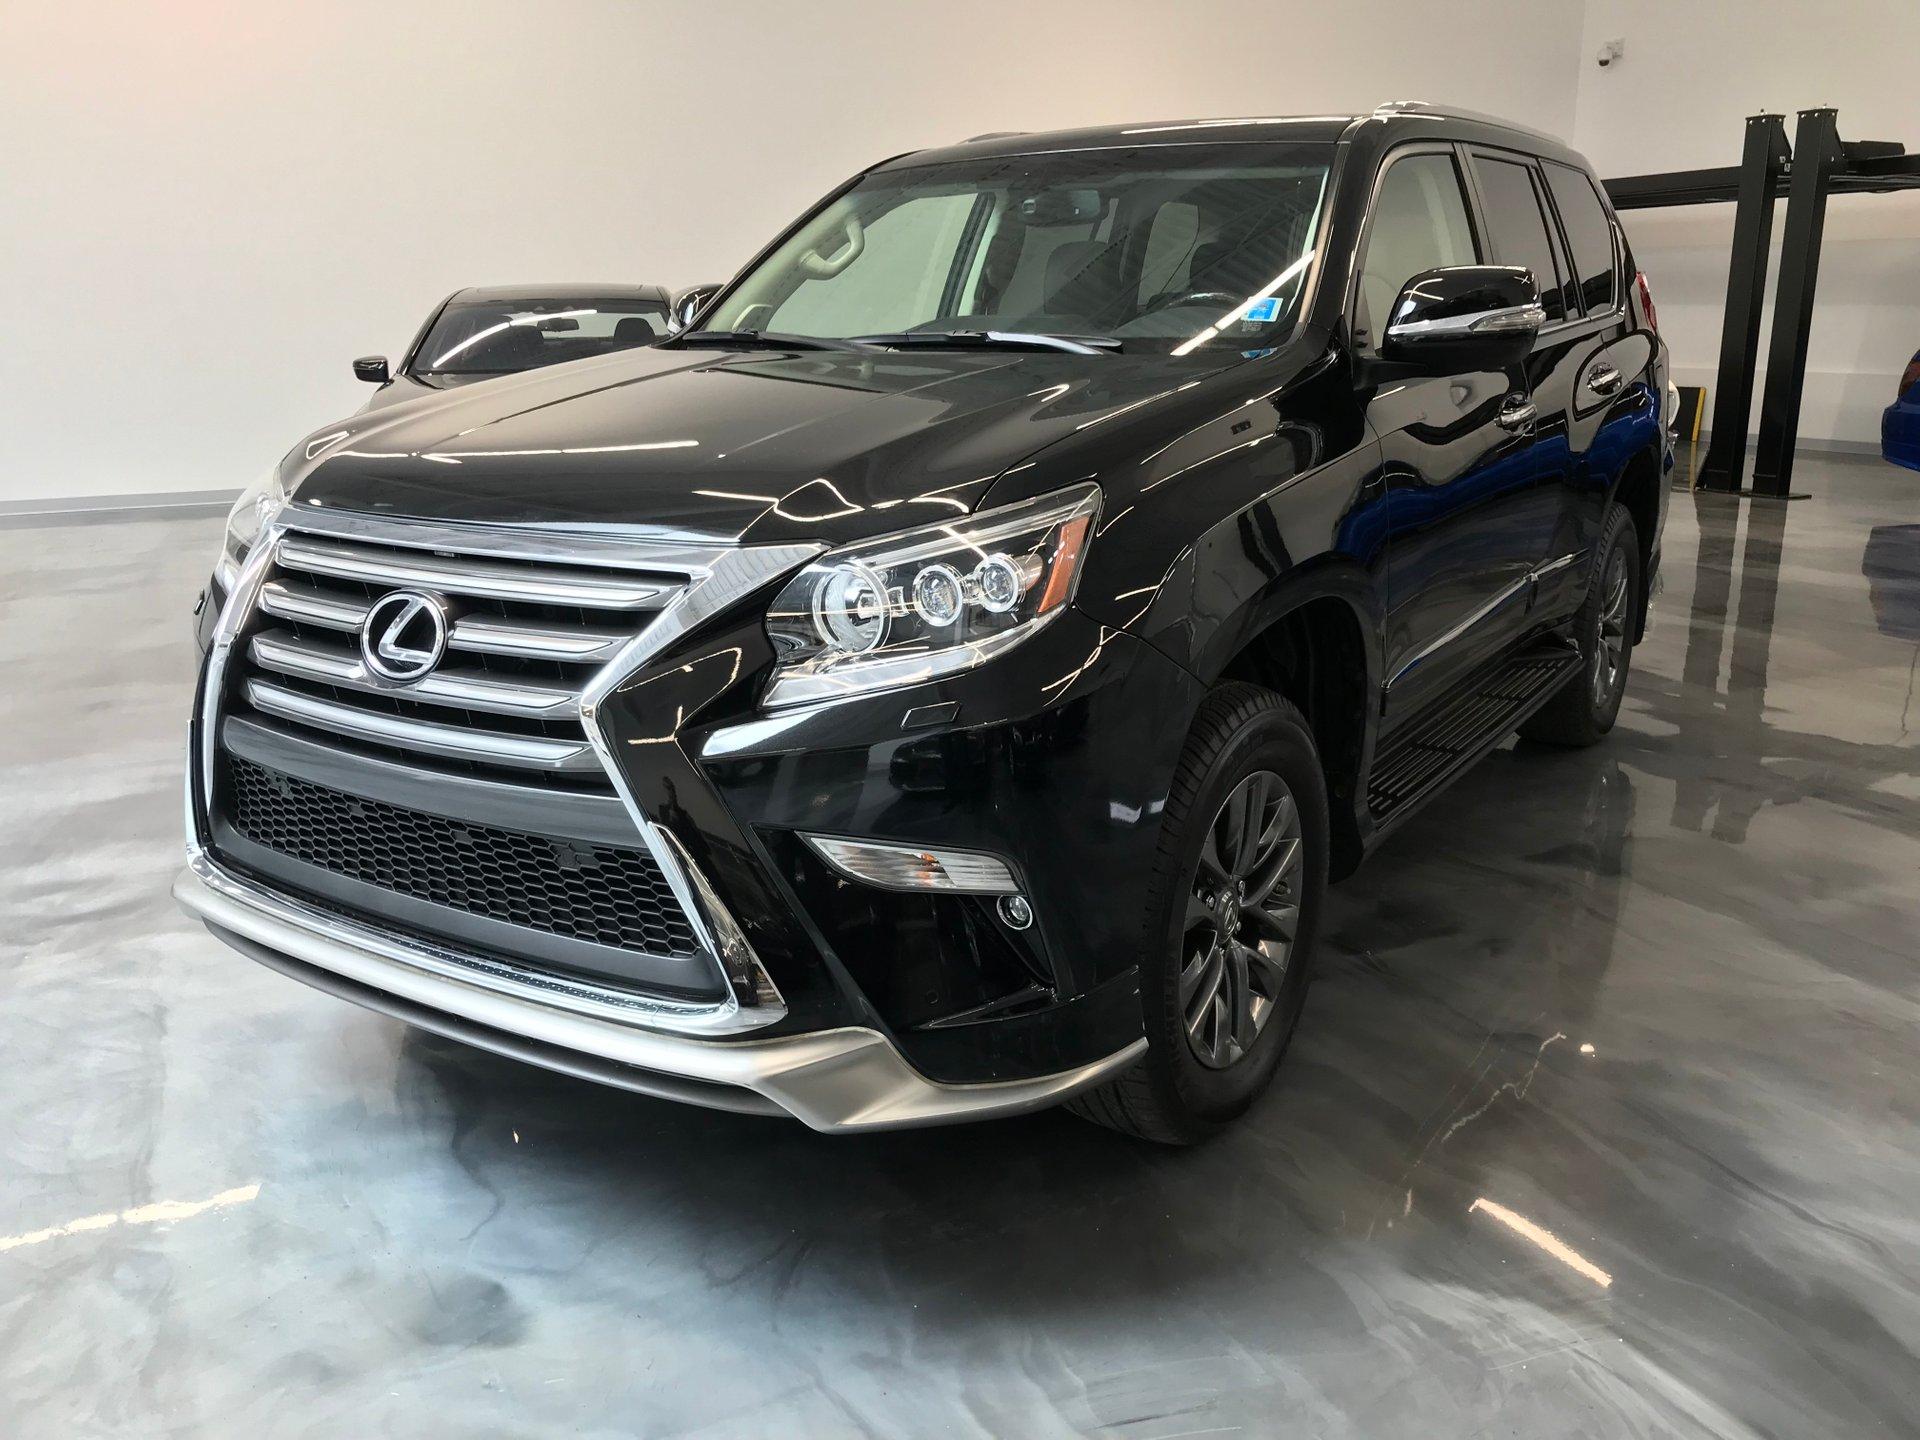 2018 lexus gx460